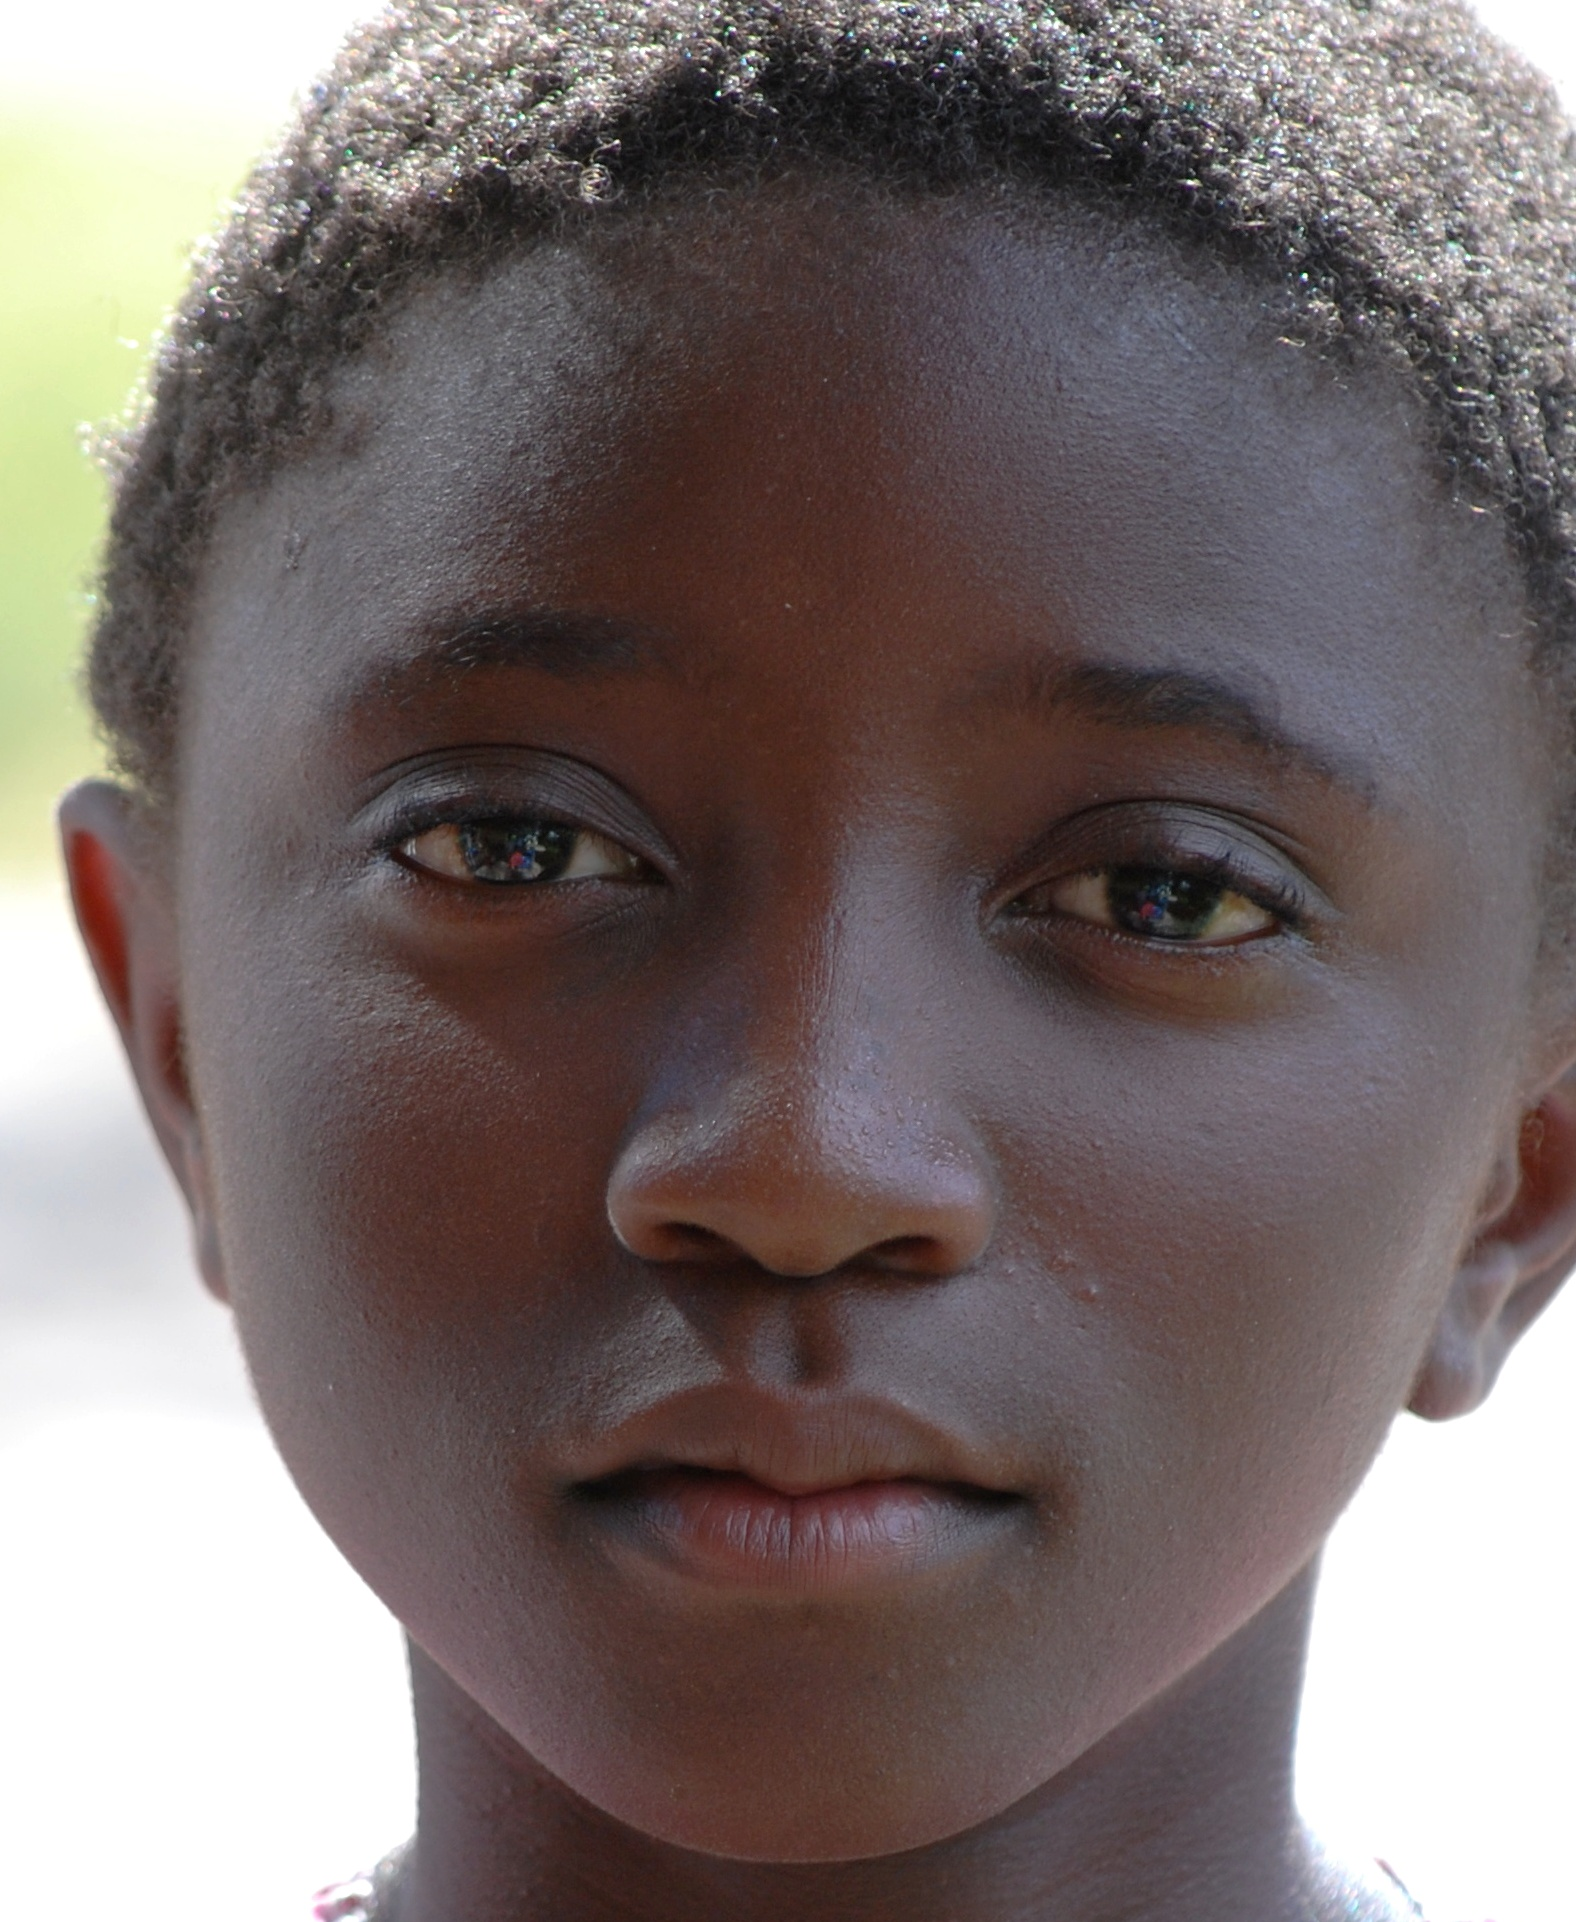 Zambia 2010 (1704).JPG